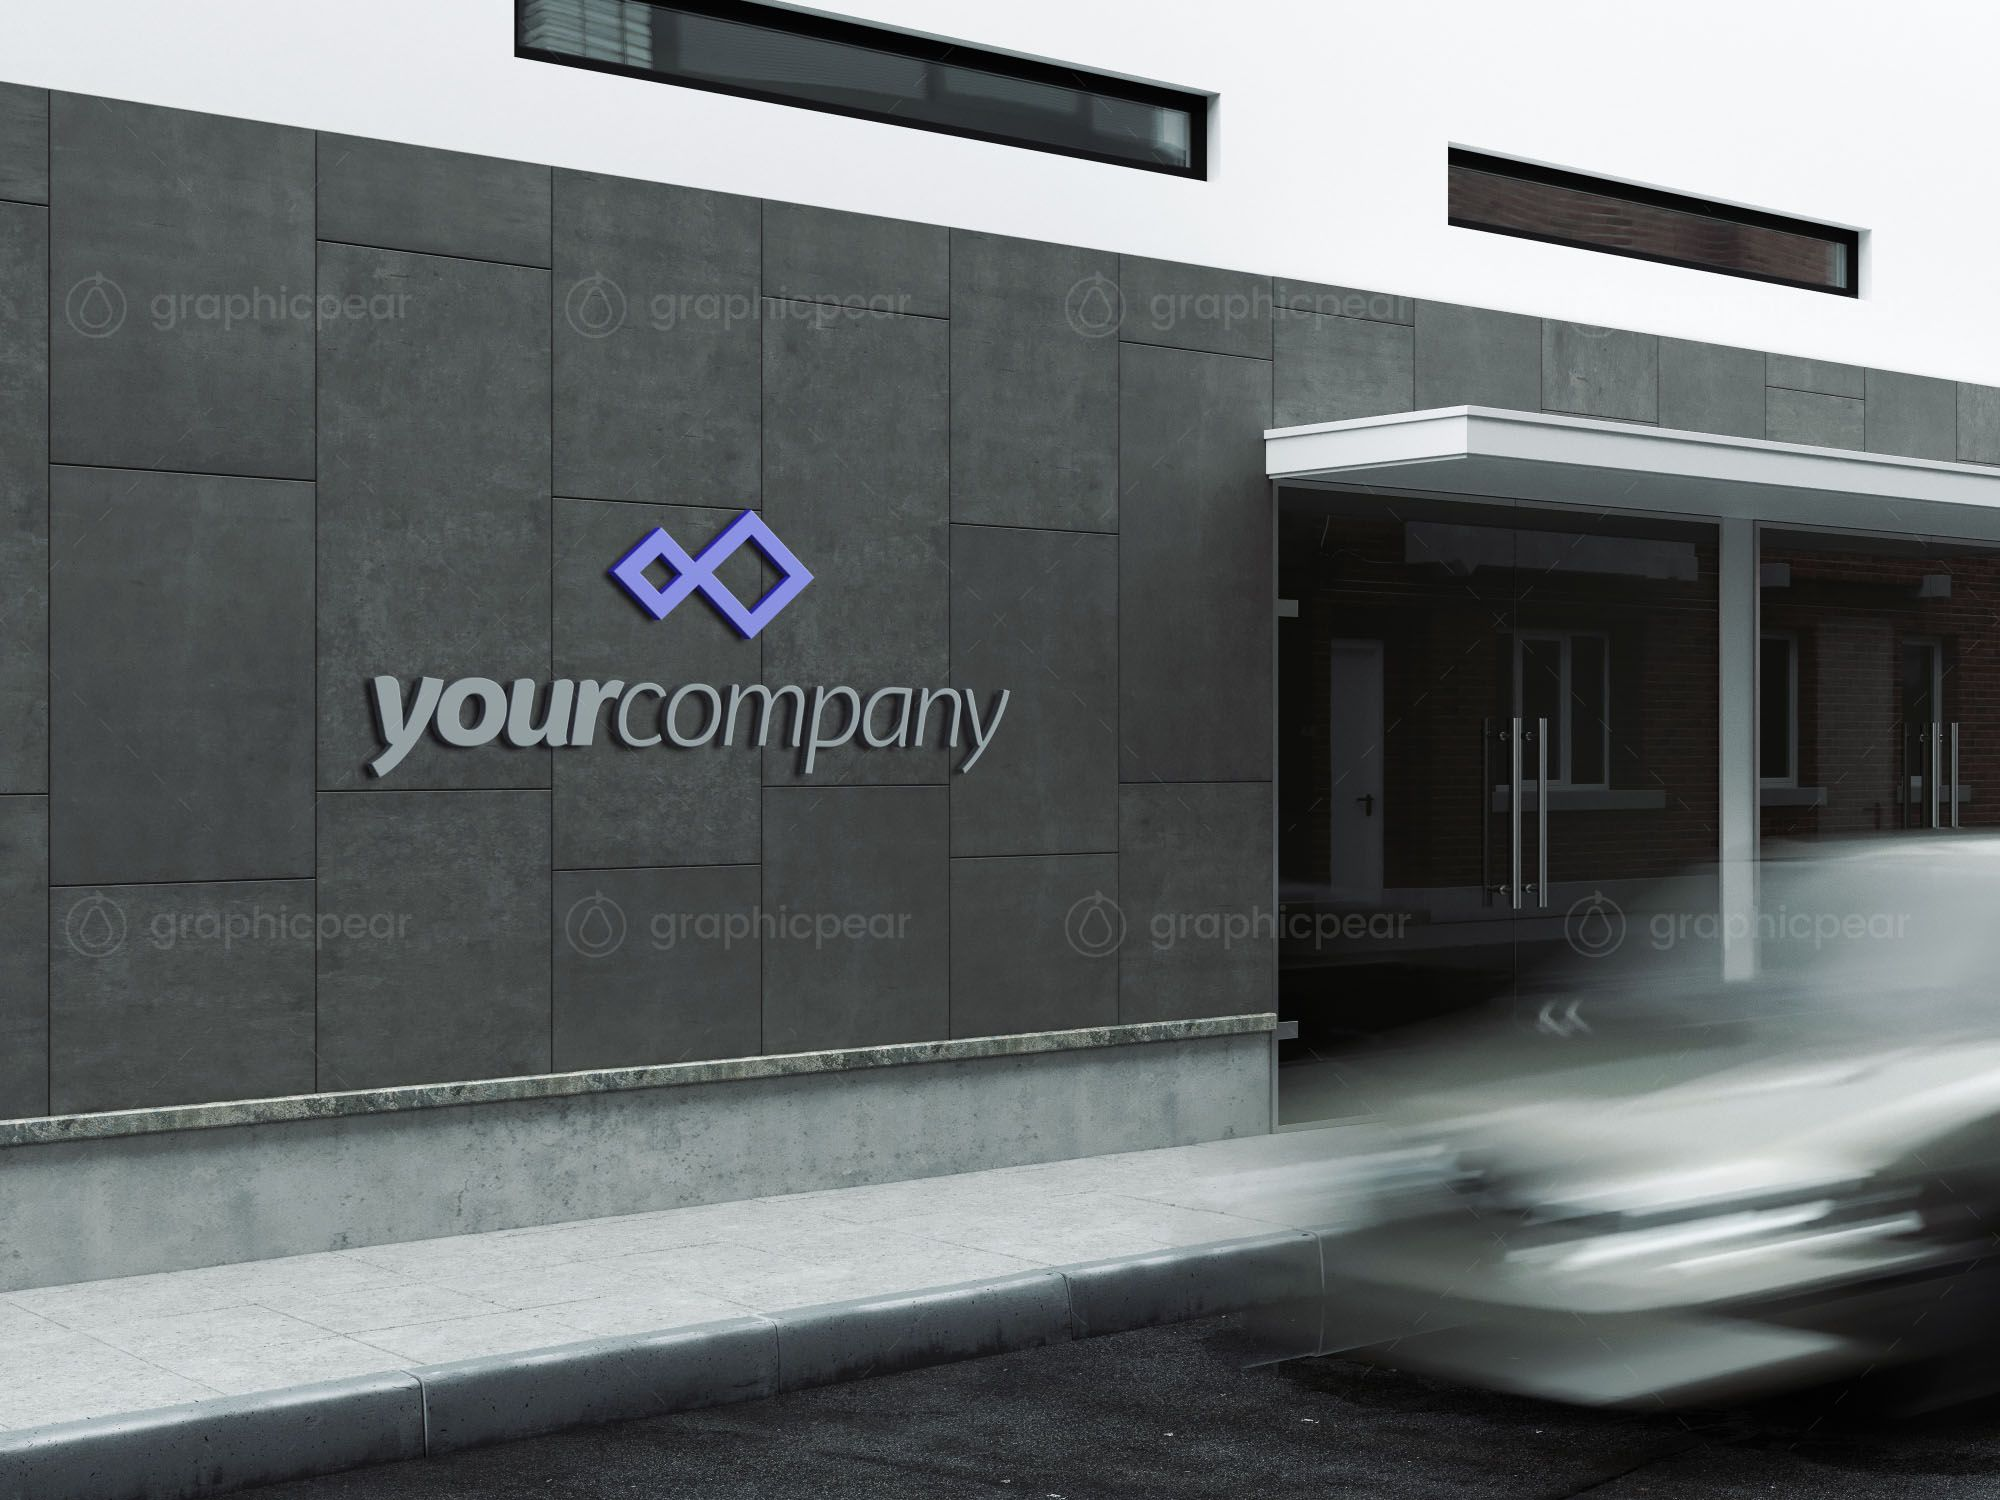 Company Building Sign Mockup In 2021 Building Signs Mockup Sign Mockup